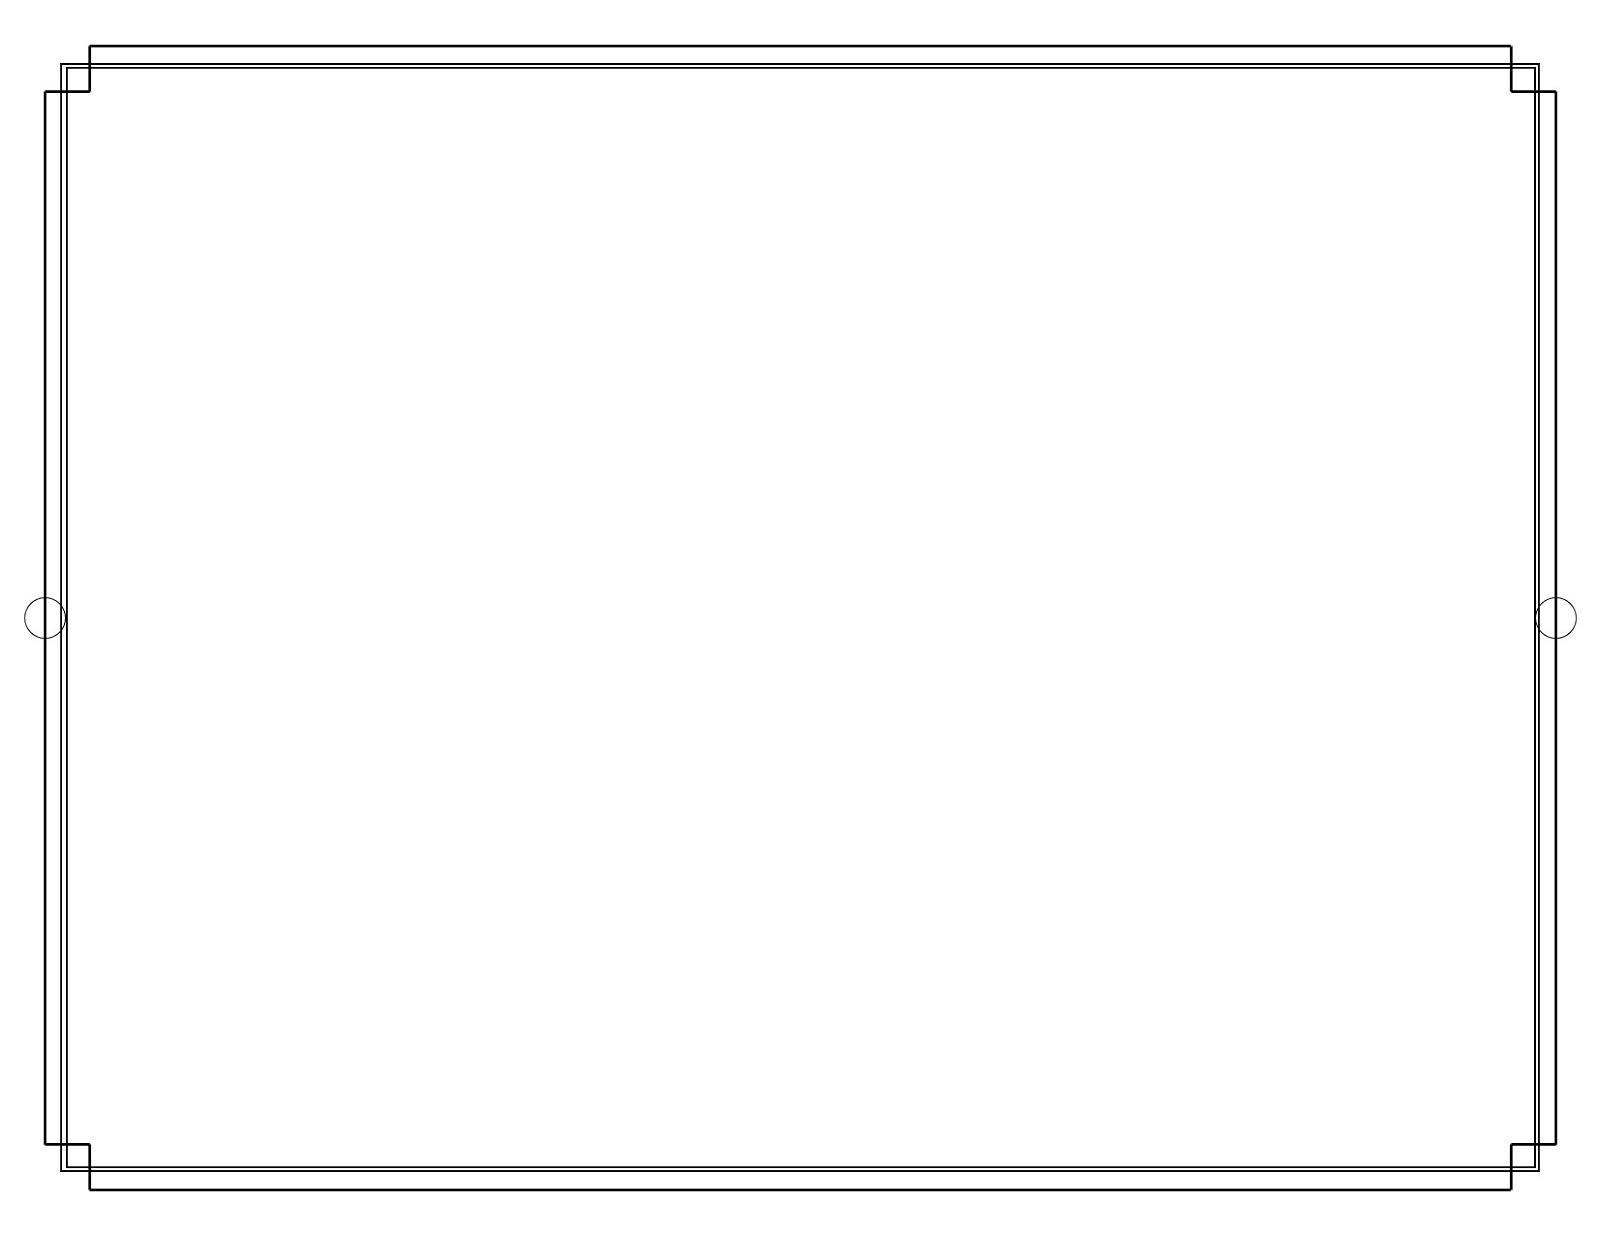 [Mattwins]: Certificate of Appreciation Blank Template